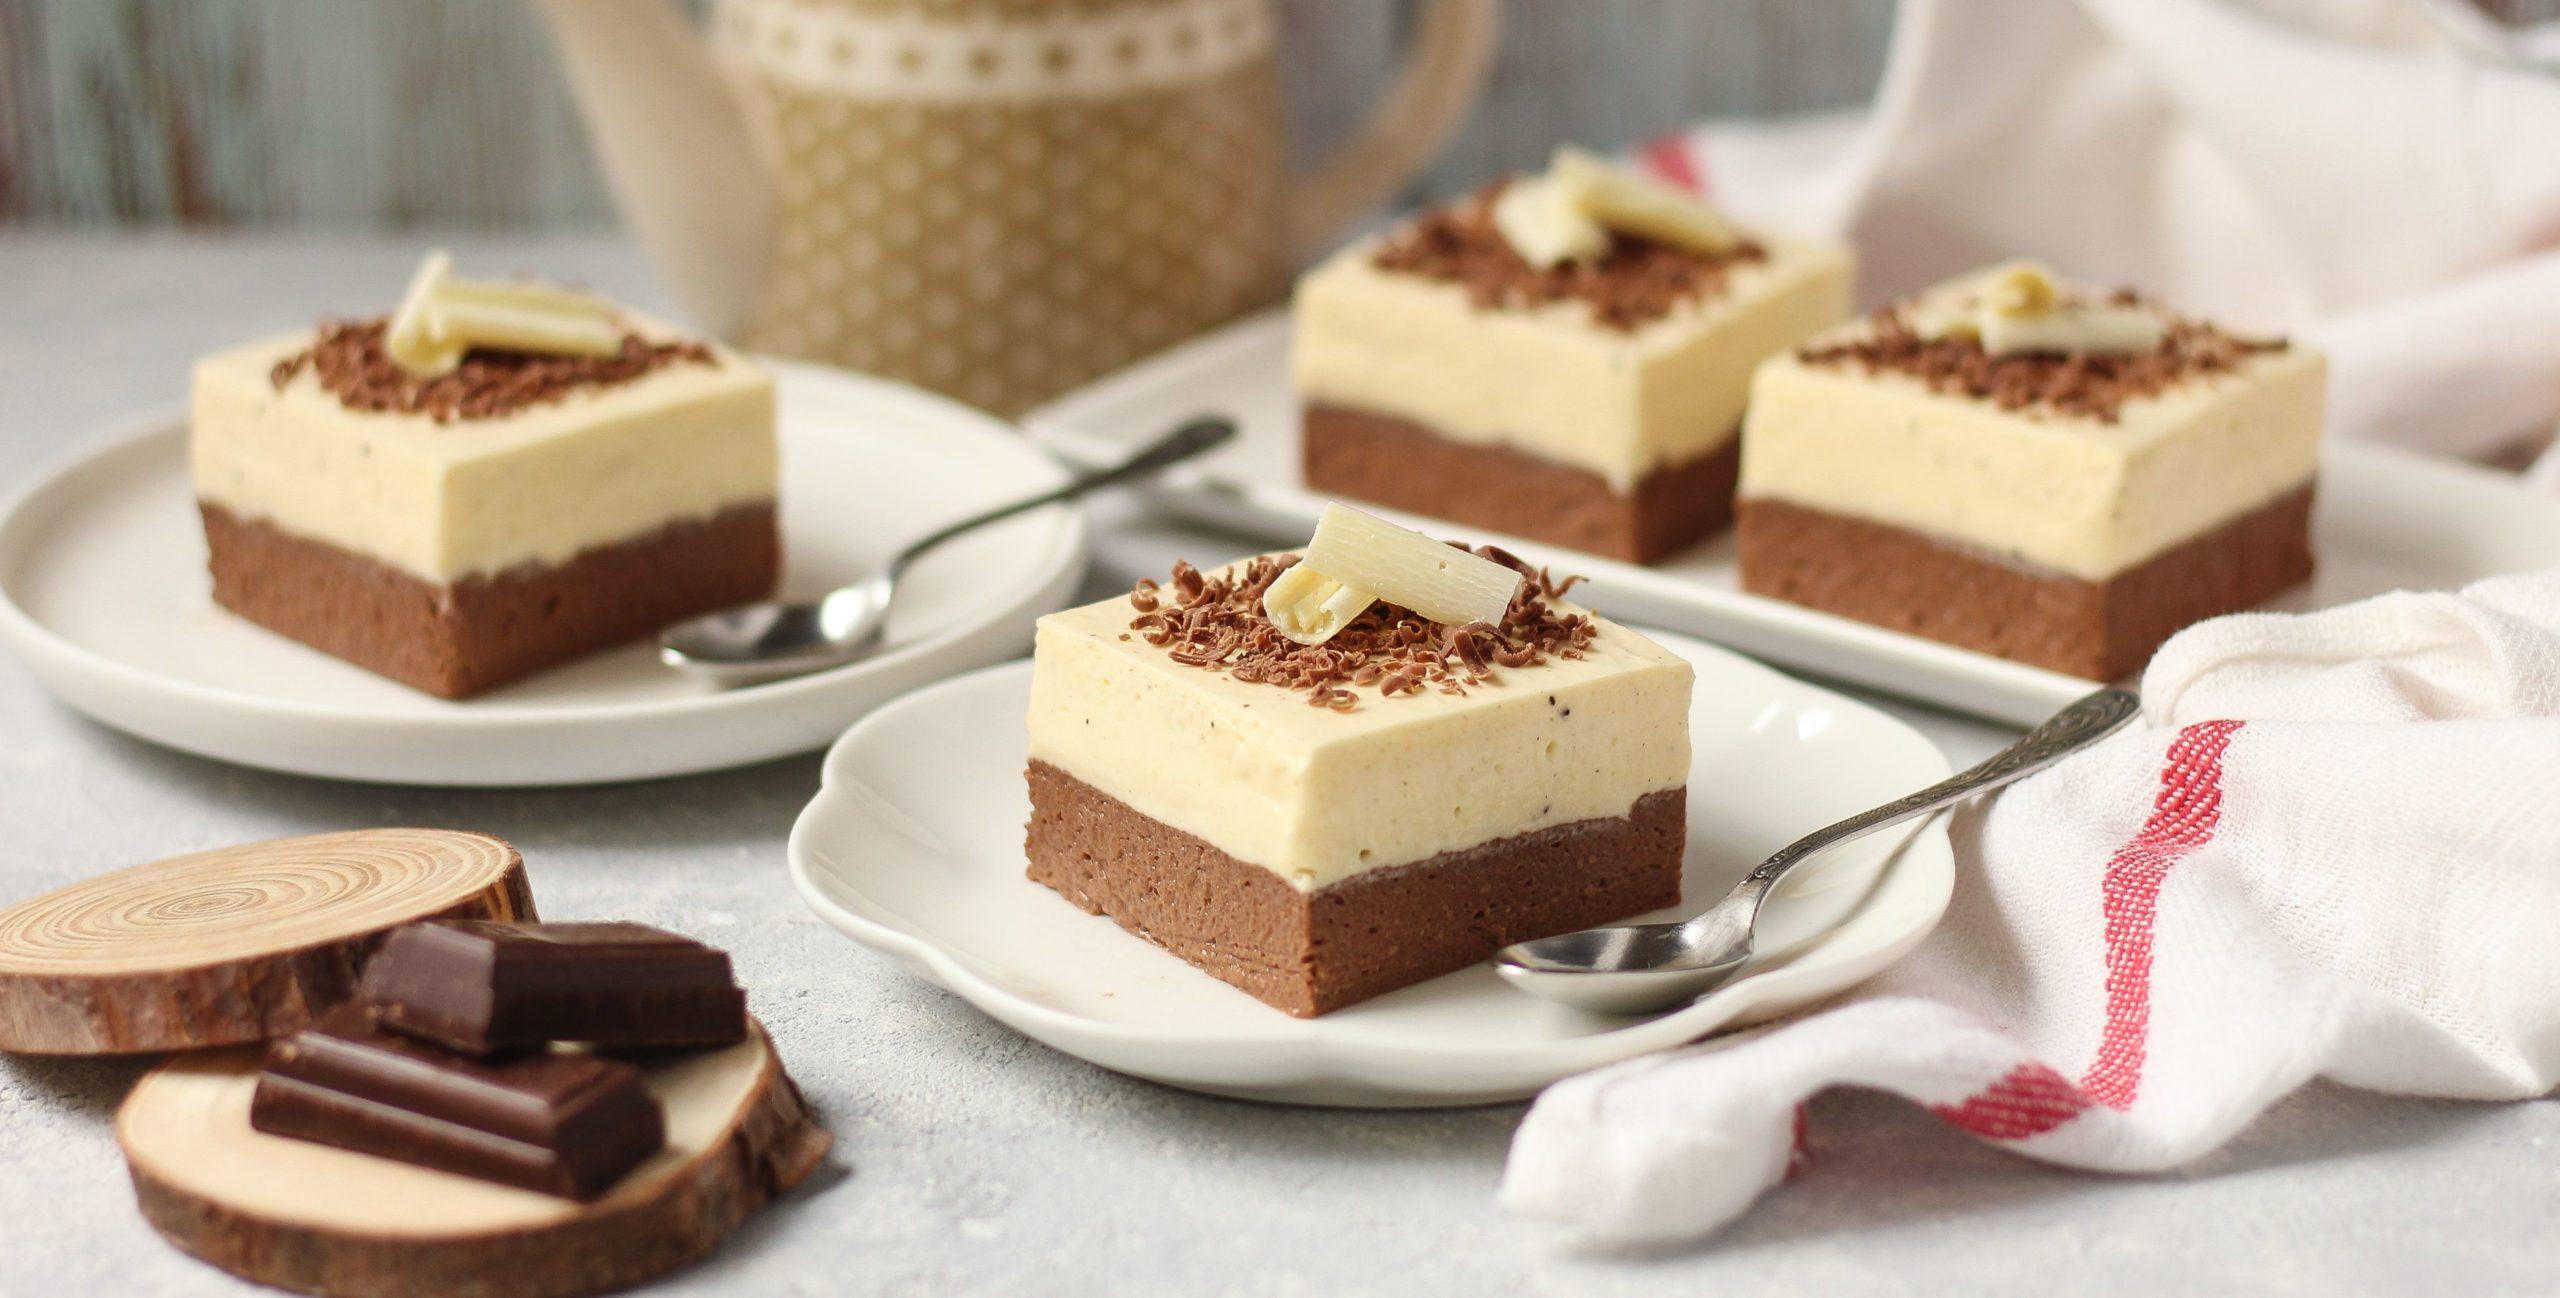 specijalni recept čokolada